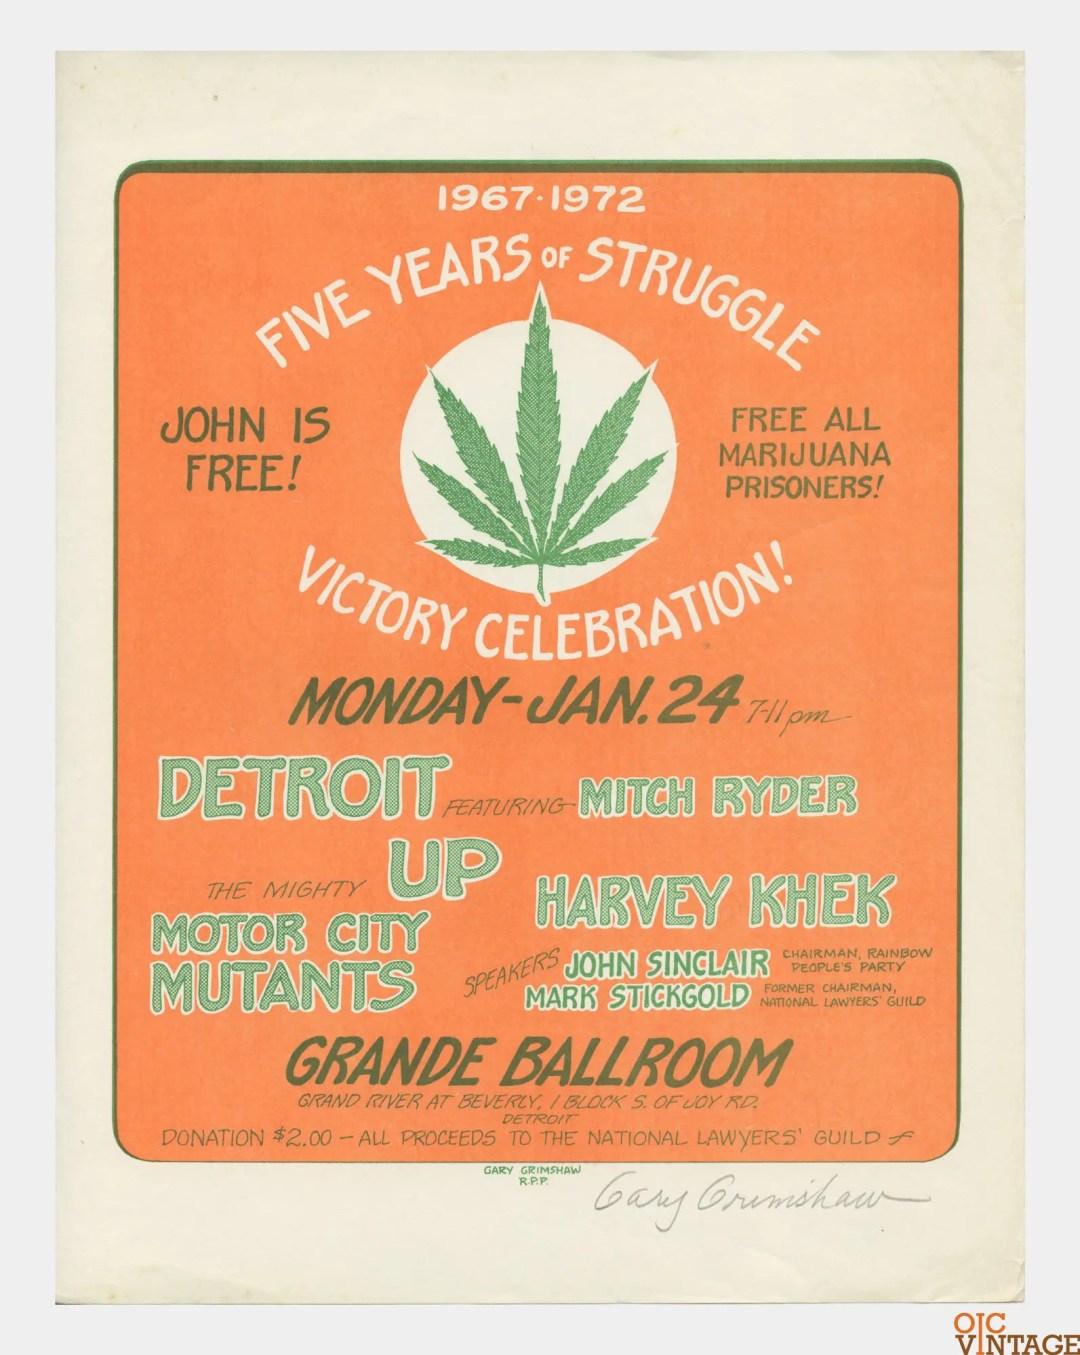 Grande Ballroom Handbill 1972 Jan 24 Gary Grimshaw signed Five Years of Struggle